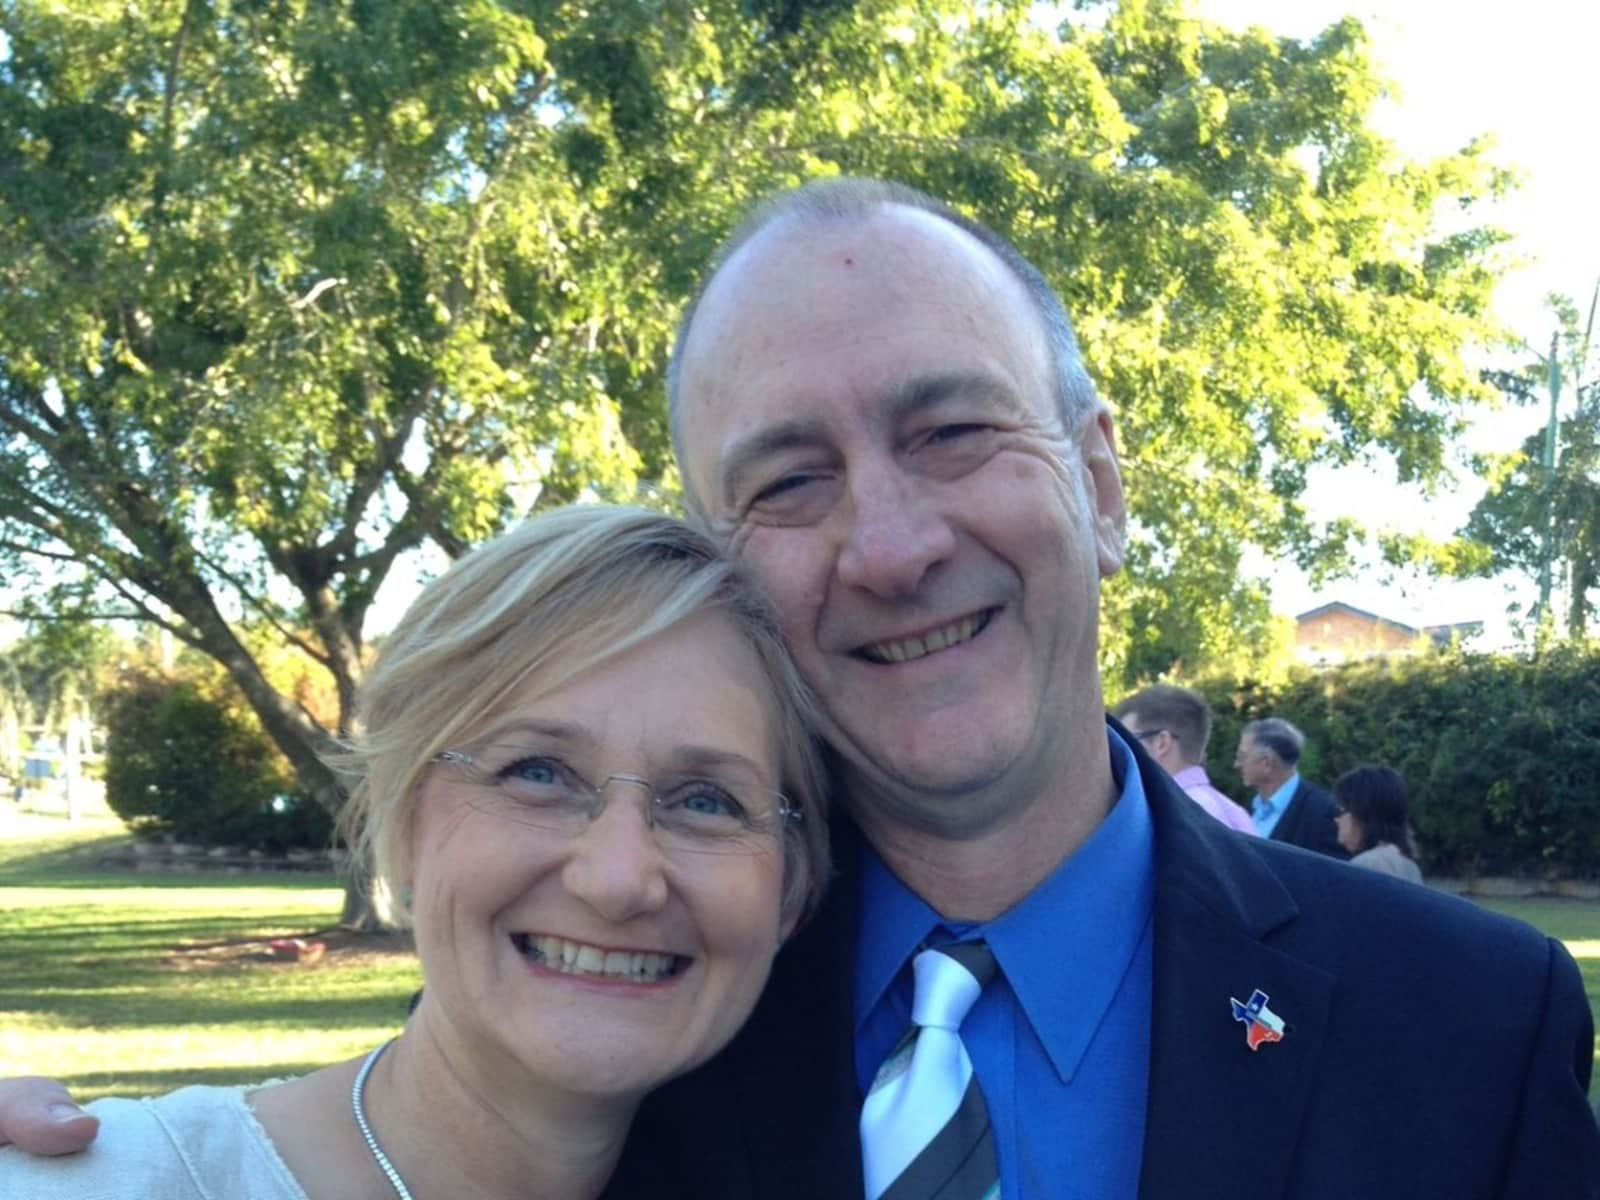 Bob & Leanne from Brisbane, Queensland, Australia